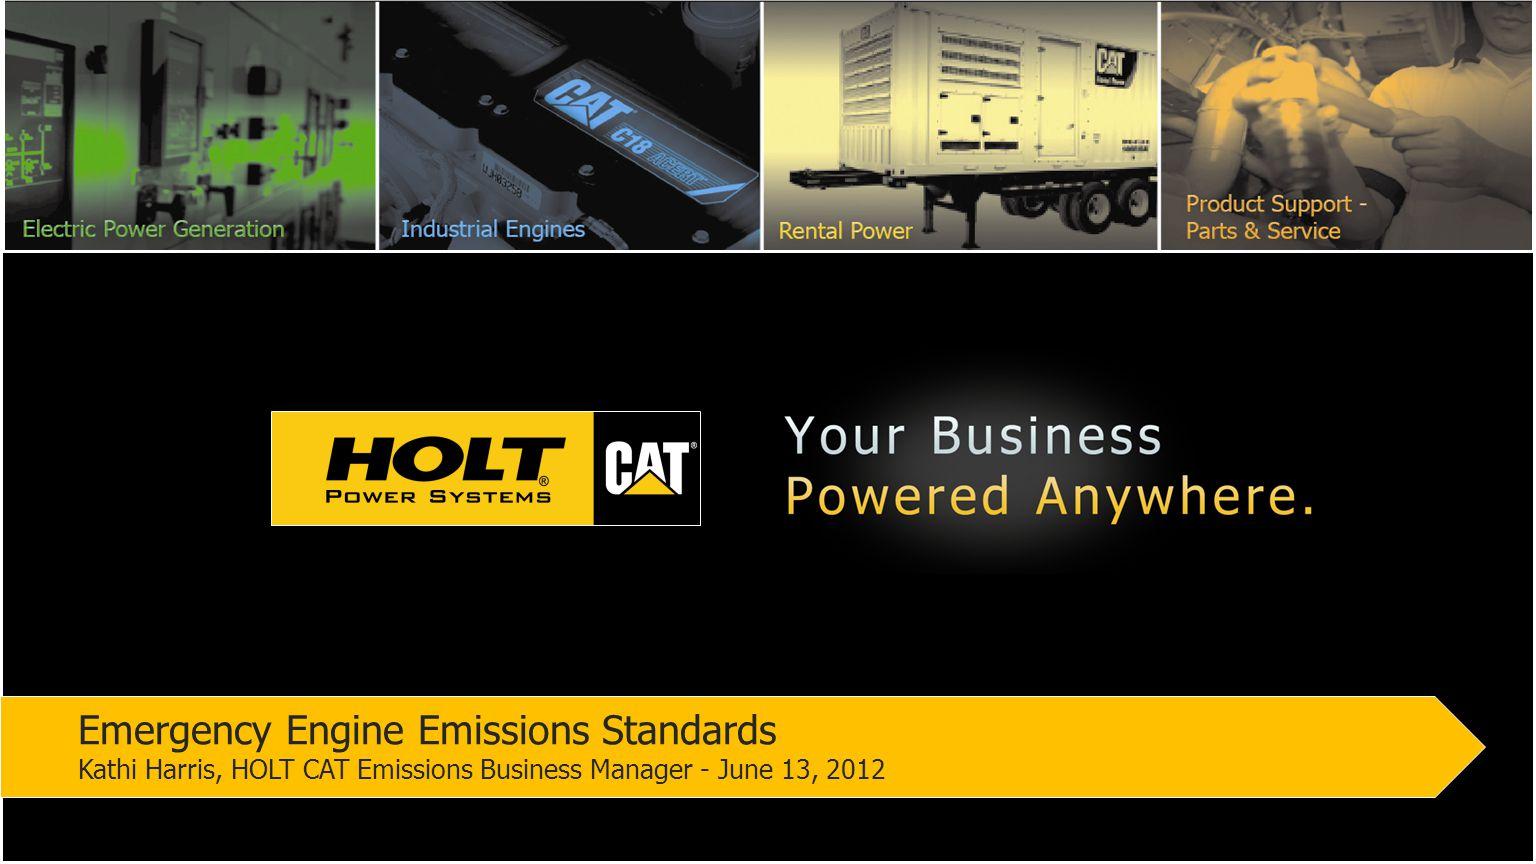 Emergency Engine Emissions Standards